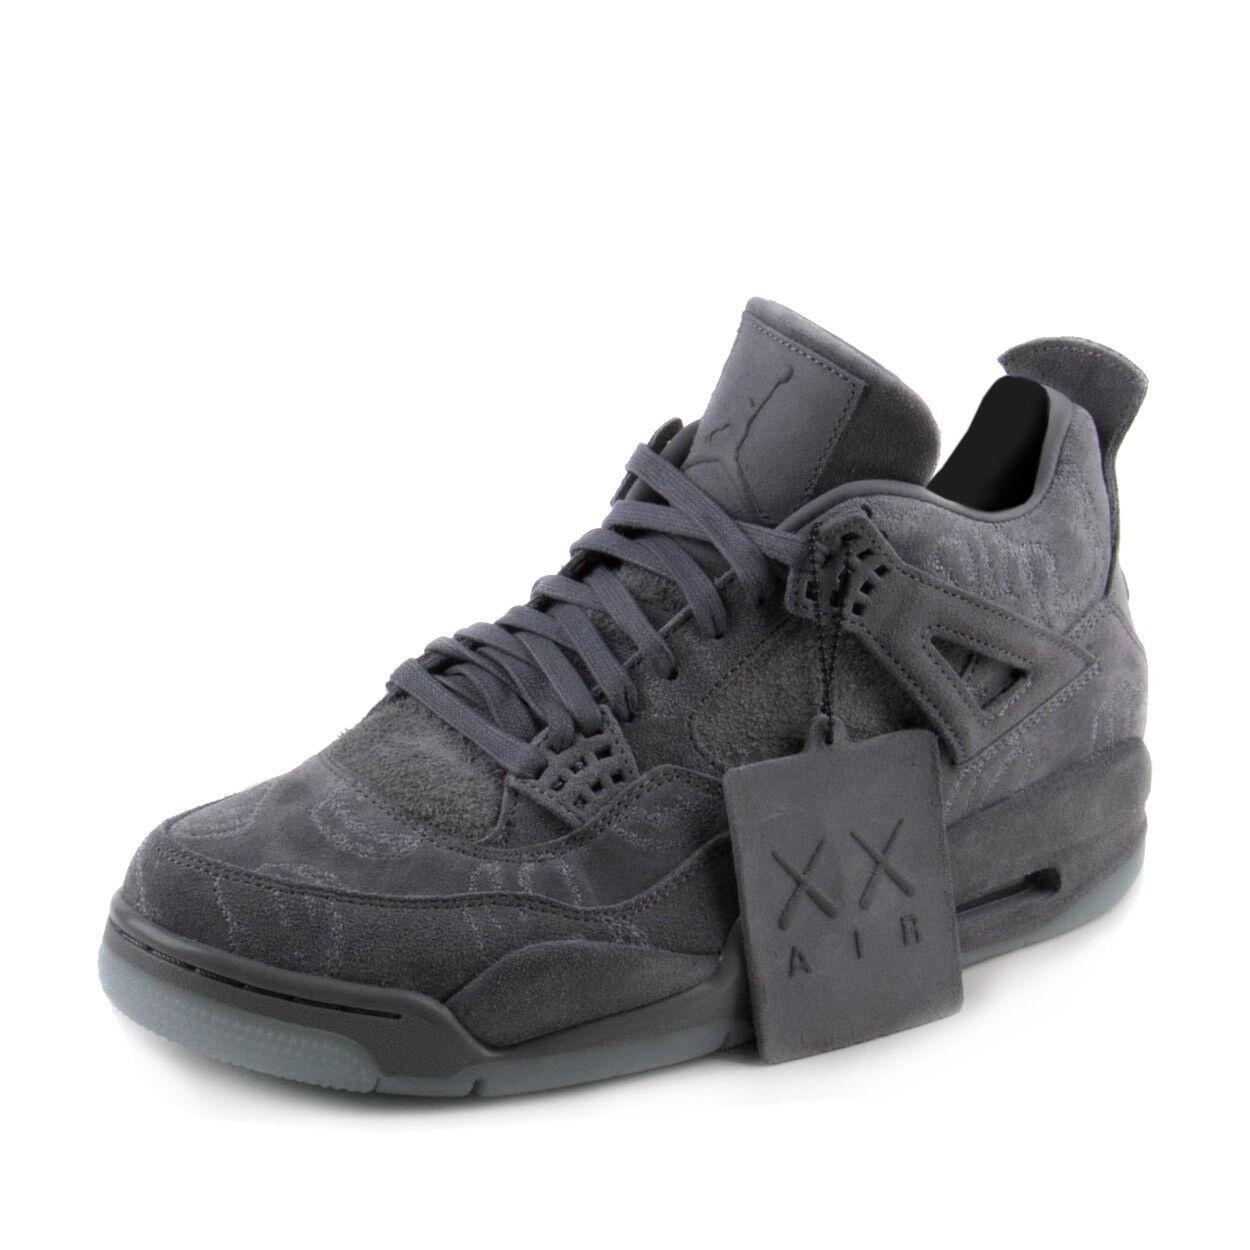 Nike air 'mens jordan kaws - 4 'mens air grigio / bianco 930155-003 70083f